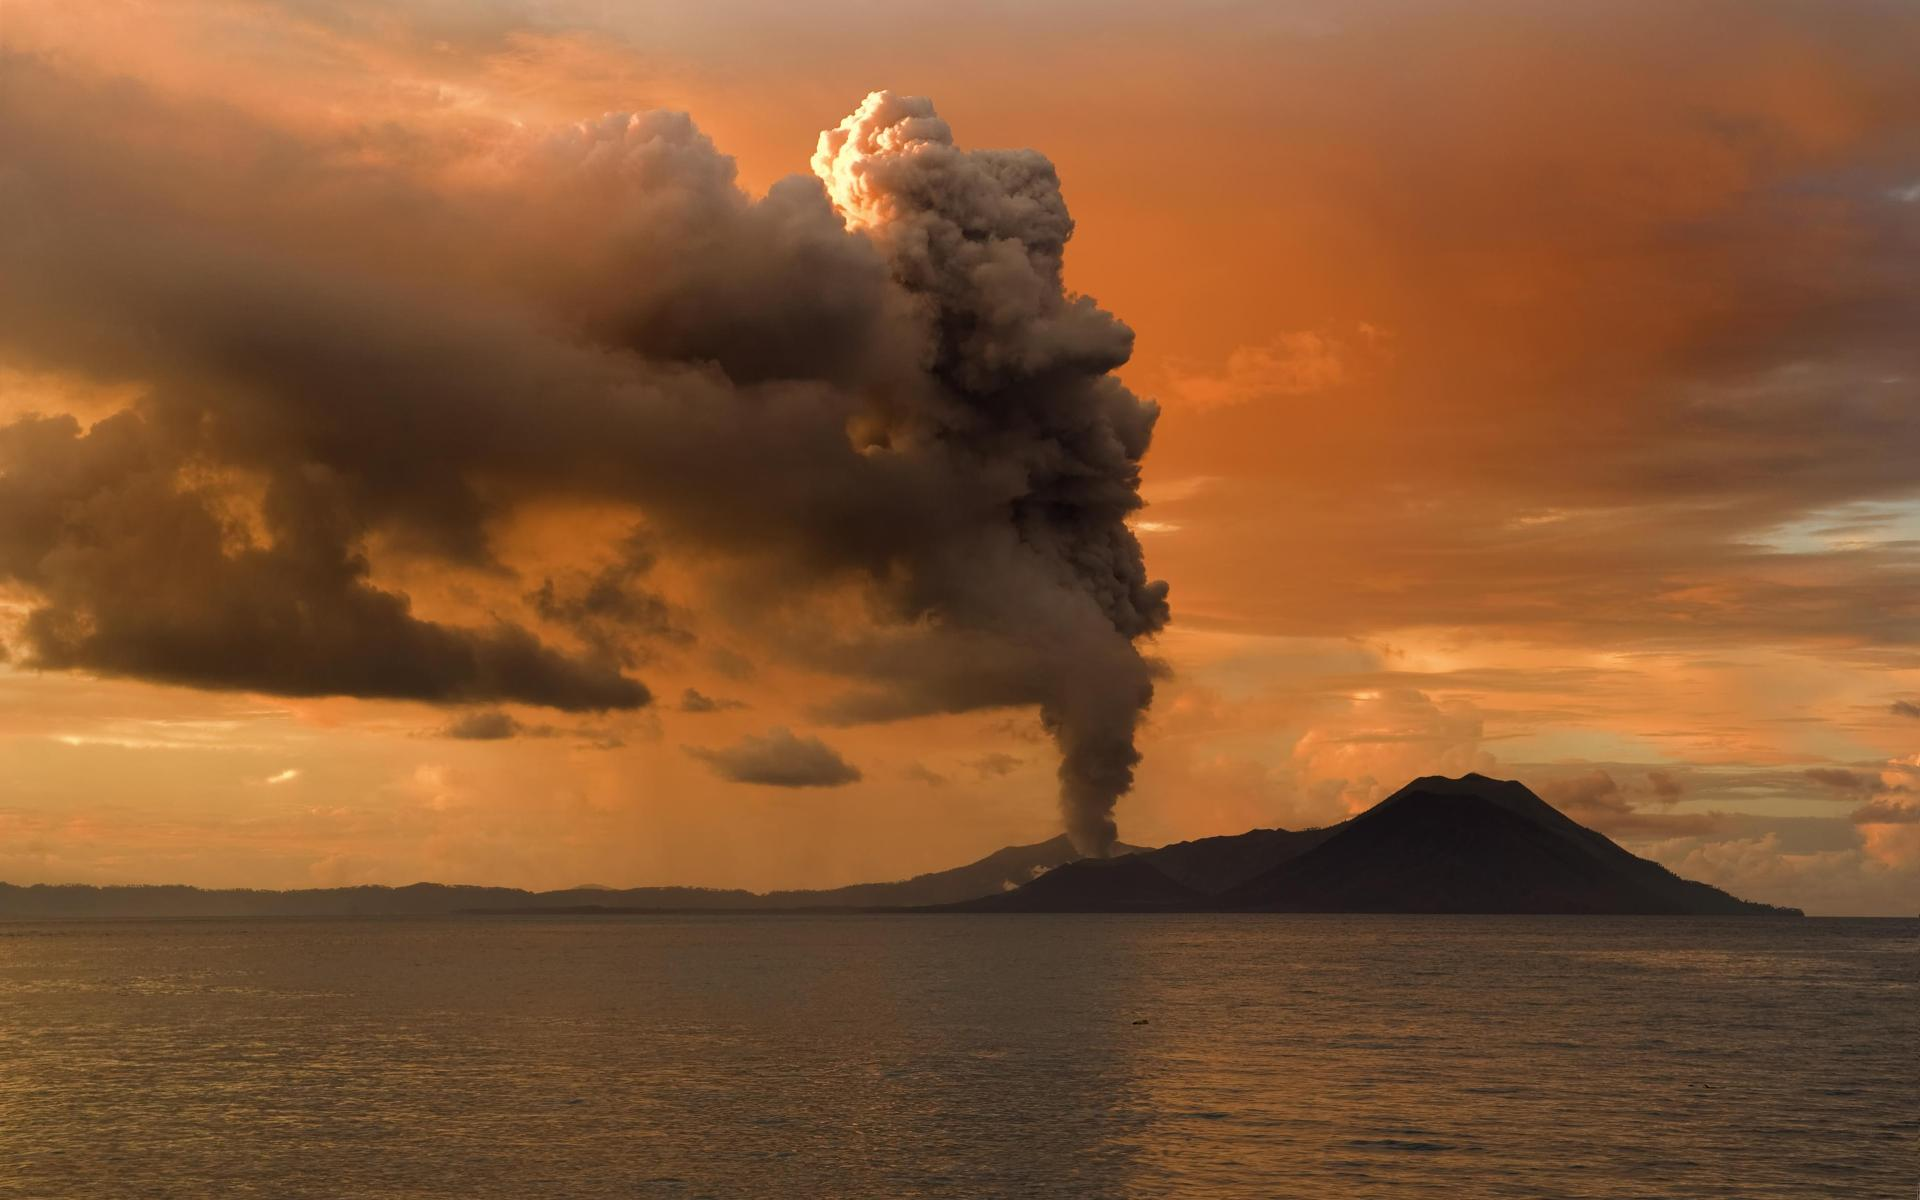 Volcano Wallpapers Hd: 14 Fantastic HD Volcano Smoke Wallpapers